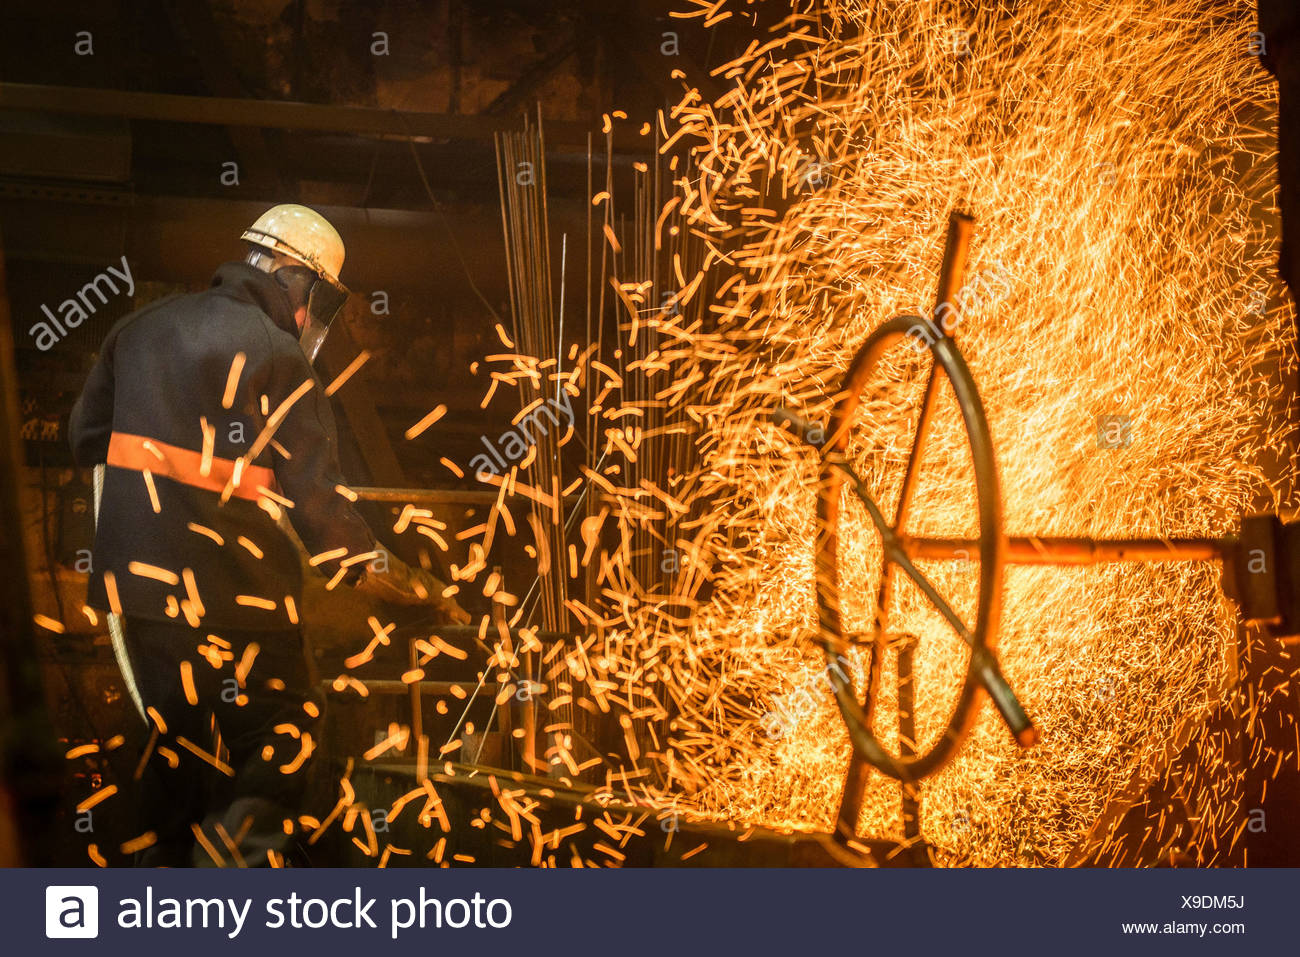 Steel worker amongst sparks in steel foundry - Stock Image